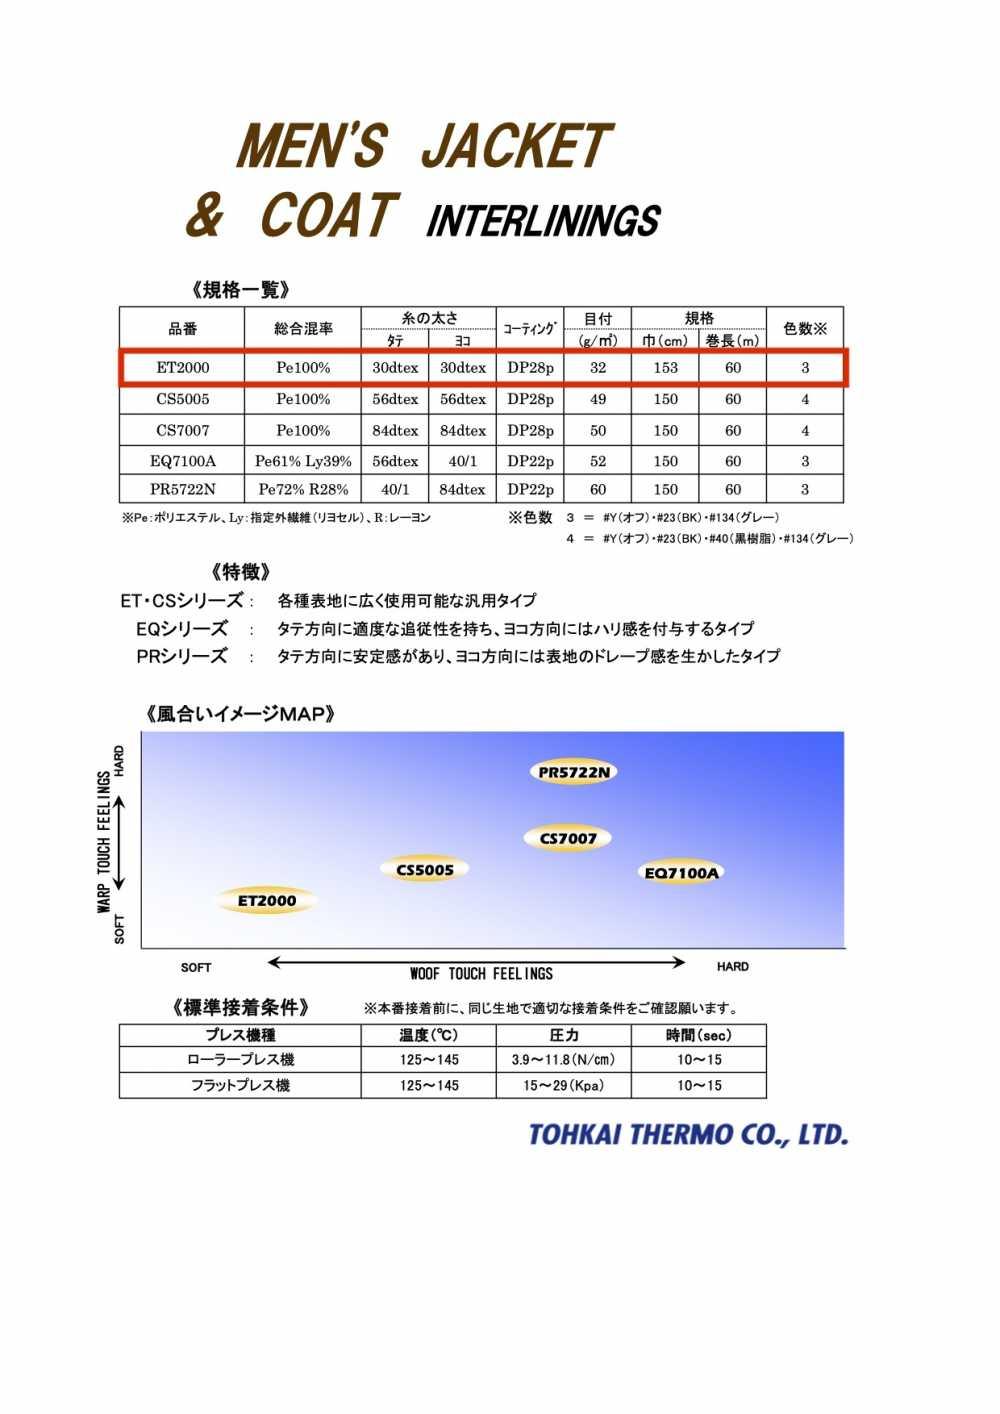 ET2000 ET・CSシリーズ <高汎用性接着芯>[芯地] 東海サーモ(Thermo)/オークラ商事 - ApparelX アパレル資材卸通販